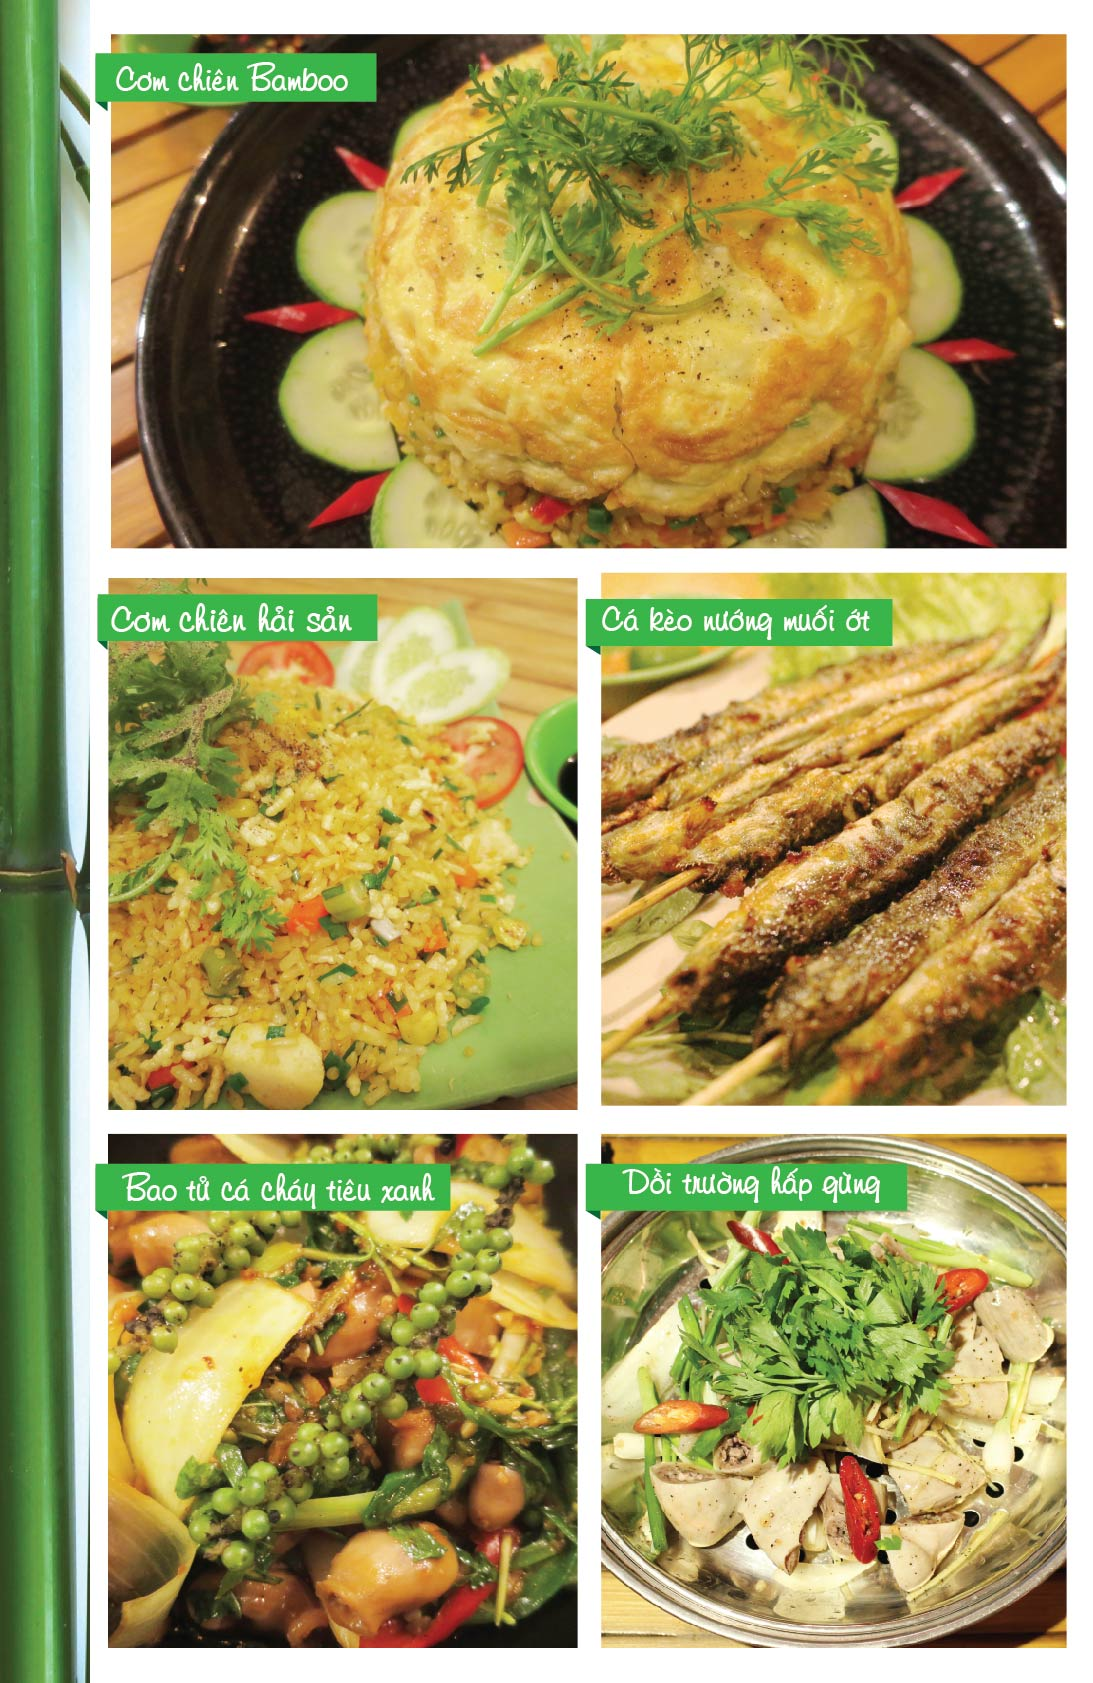 17-10_menu-bamboo-13